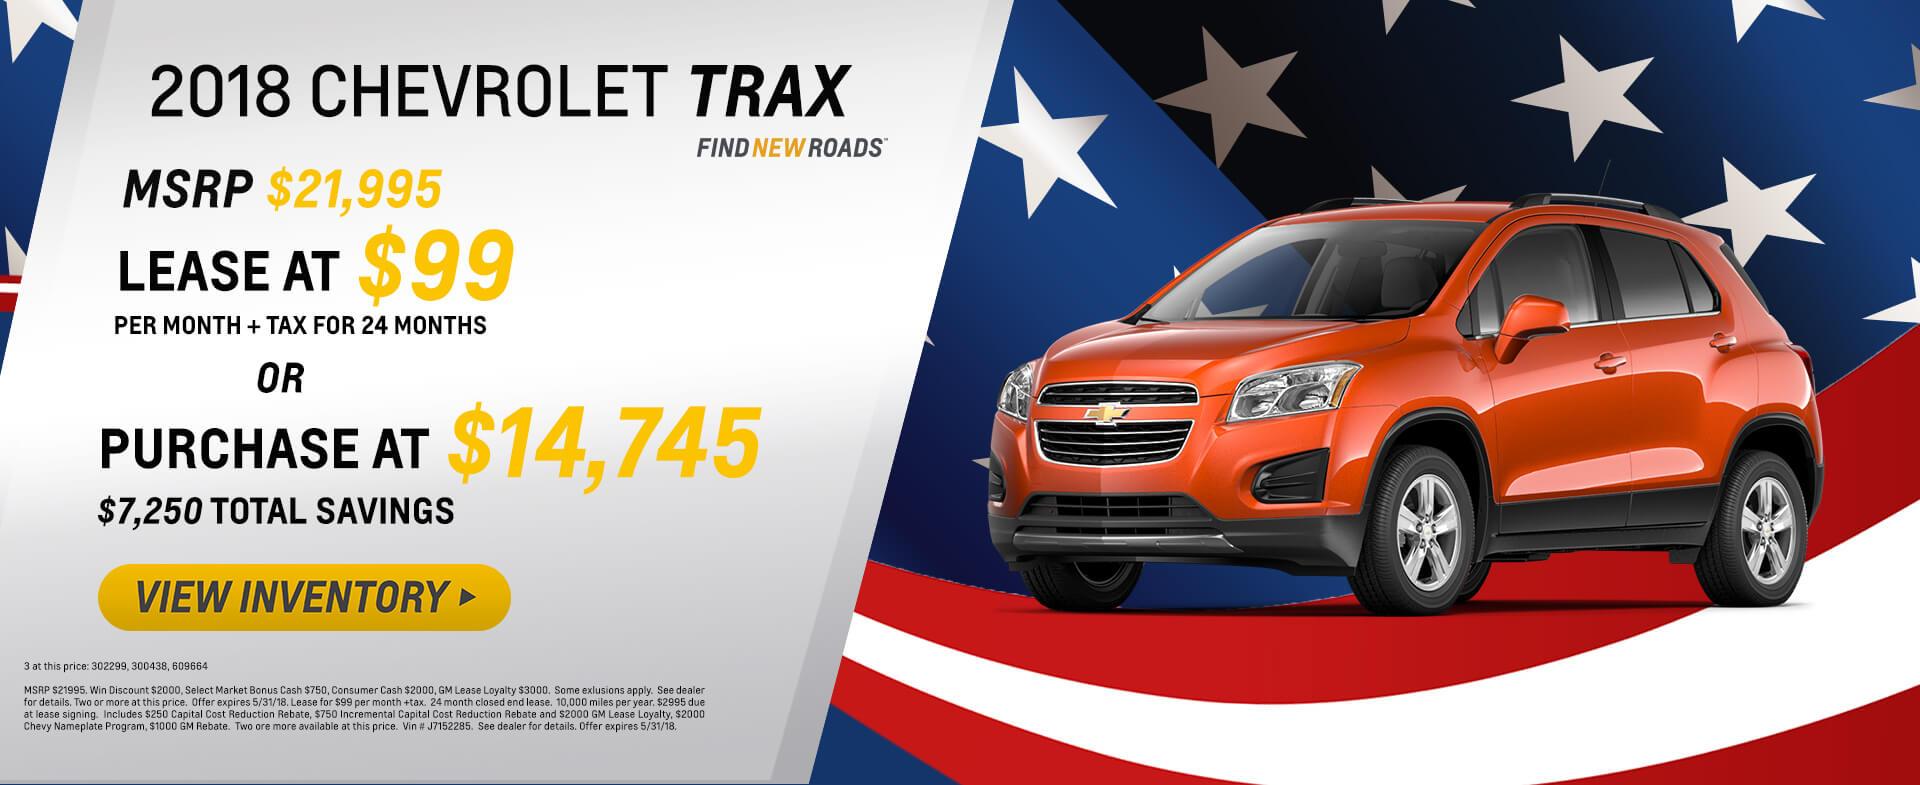 2018 Chevy Trax $99